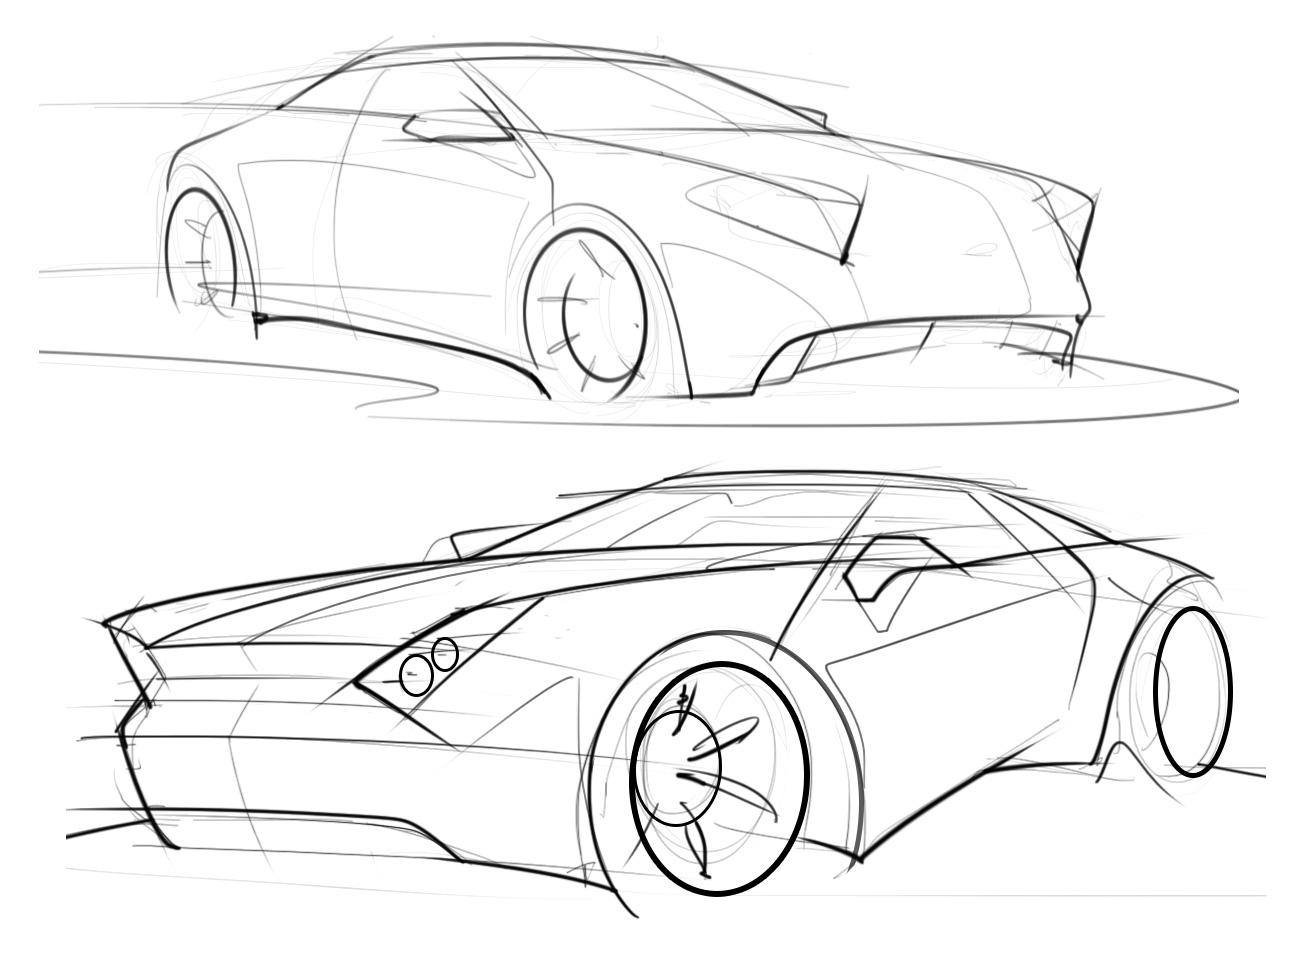 1294x959 Car Sketches With A Hard Edge Design Language Scottdesigner